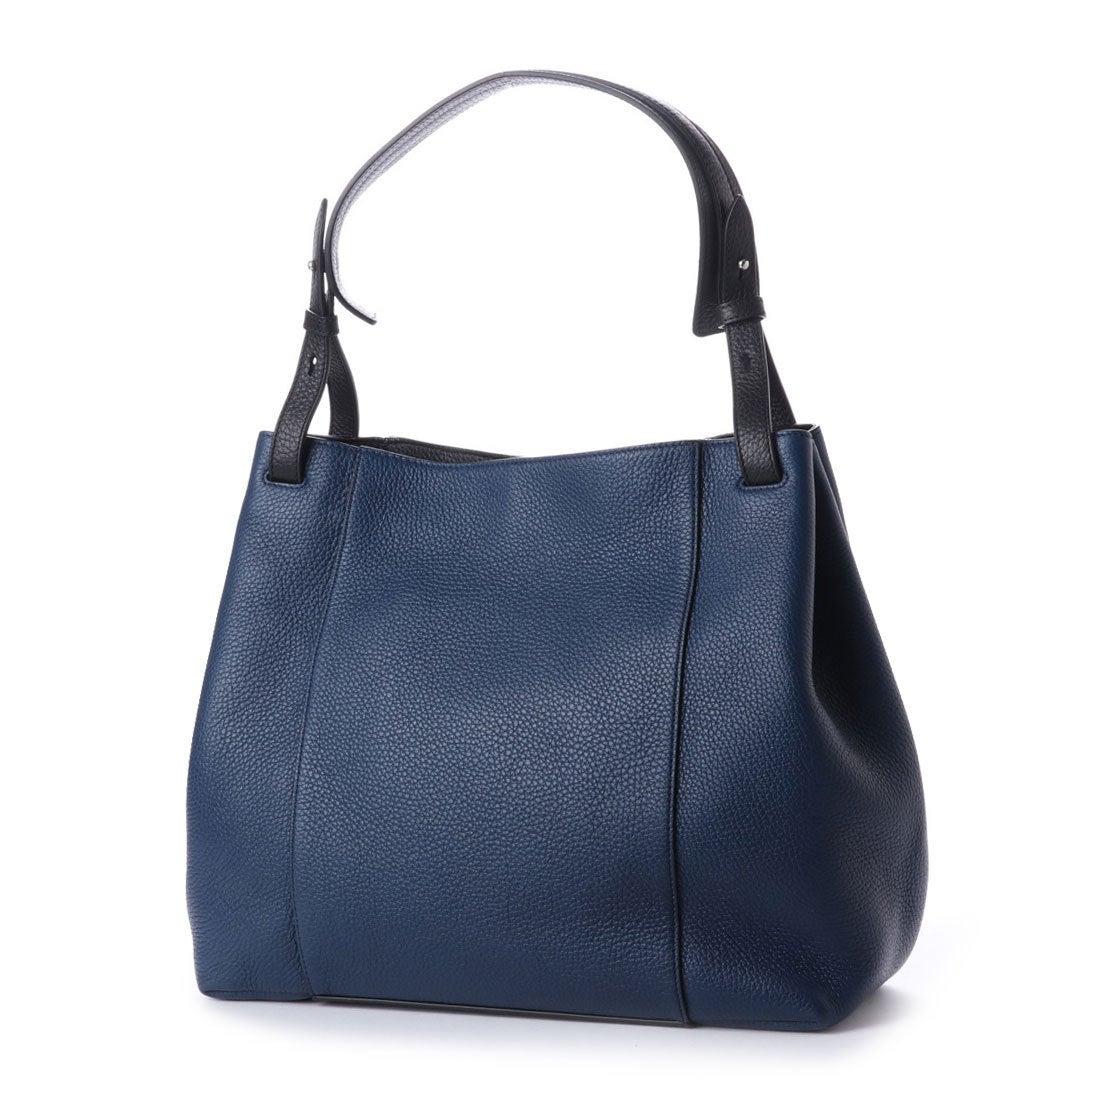 04990f890ca9 エヌティ NT(NUMBER TWENTY-ONE) バッグ (ネイビー/ブラック) -靴&ファッション通販 ロコンド〜自宅で試着、気軽に返品